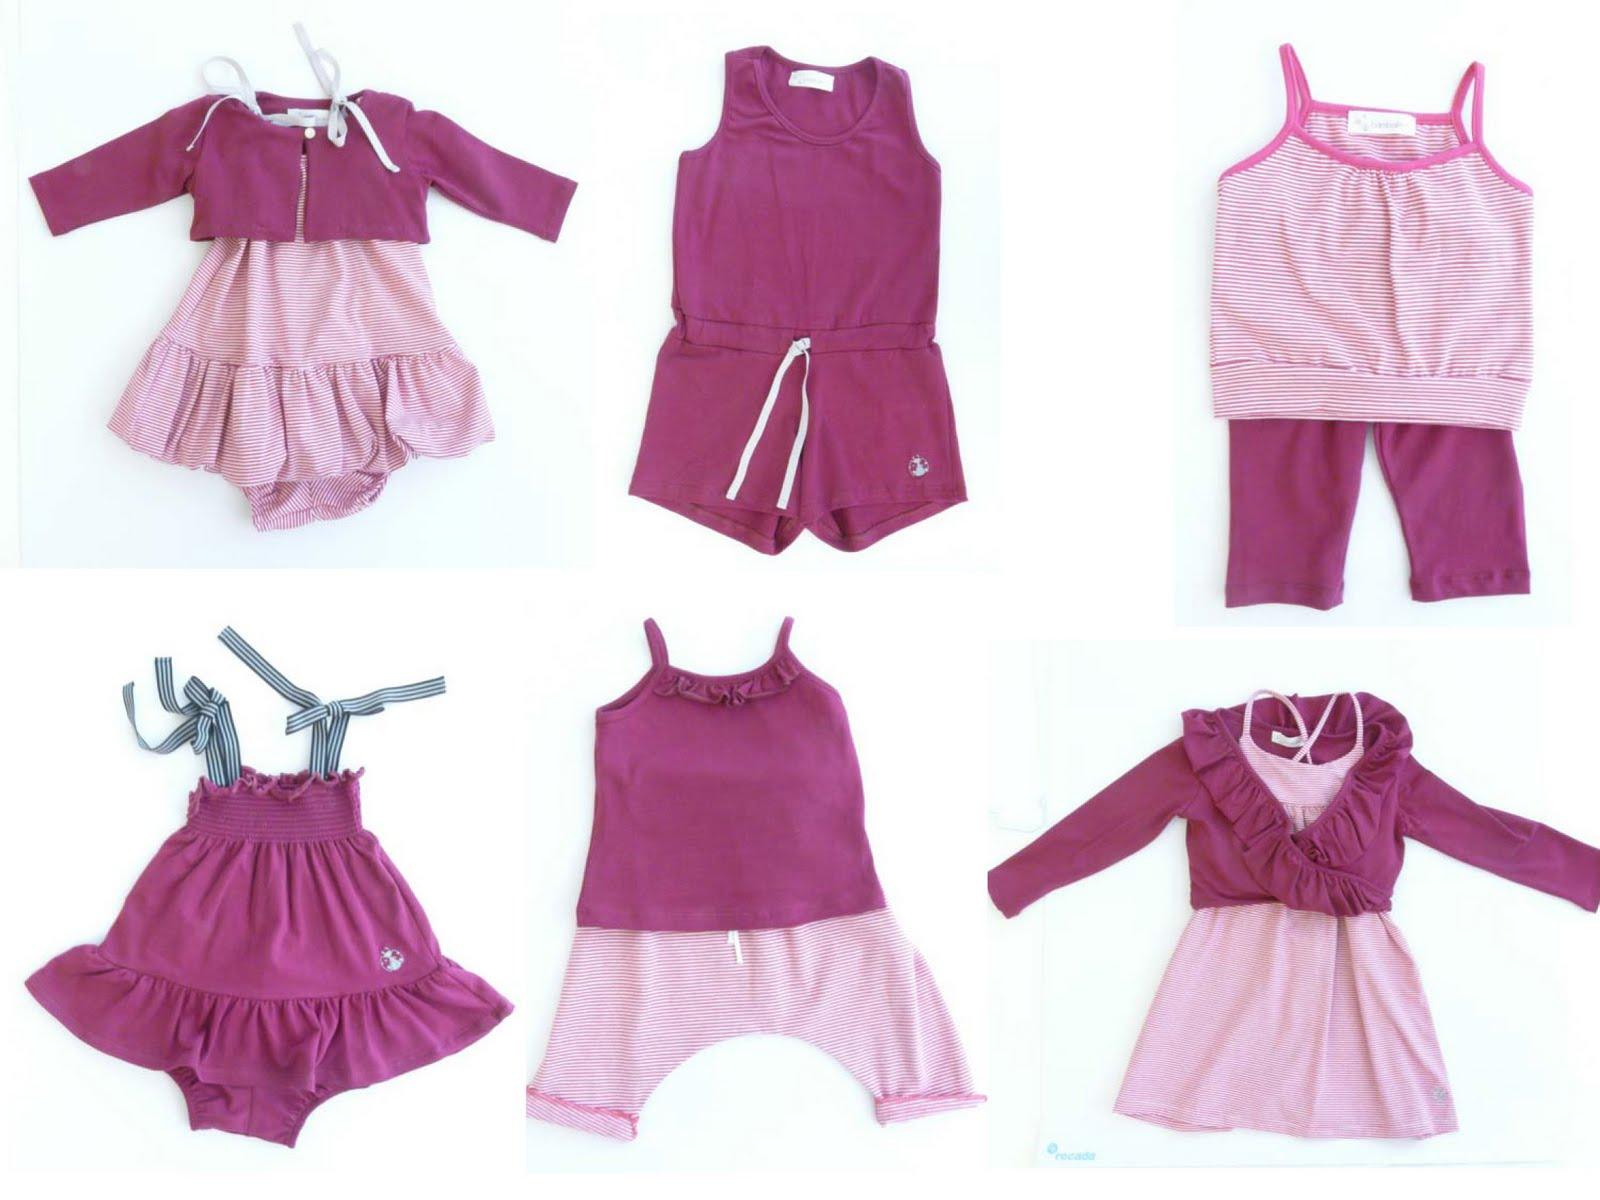 Bambalinas dise o en moda infantil diferencial y primera - Diseno ropa infantil ...